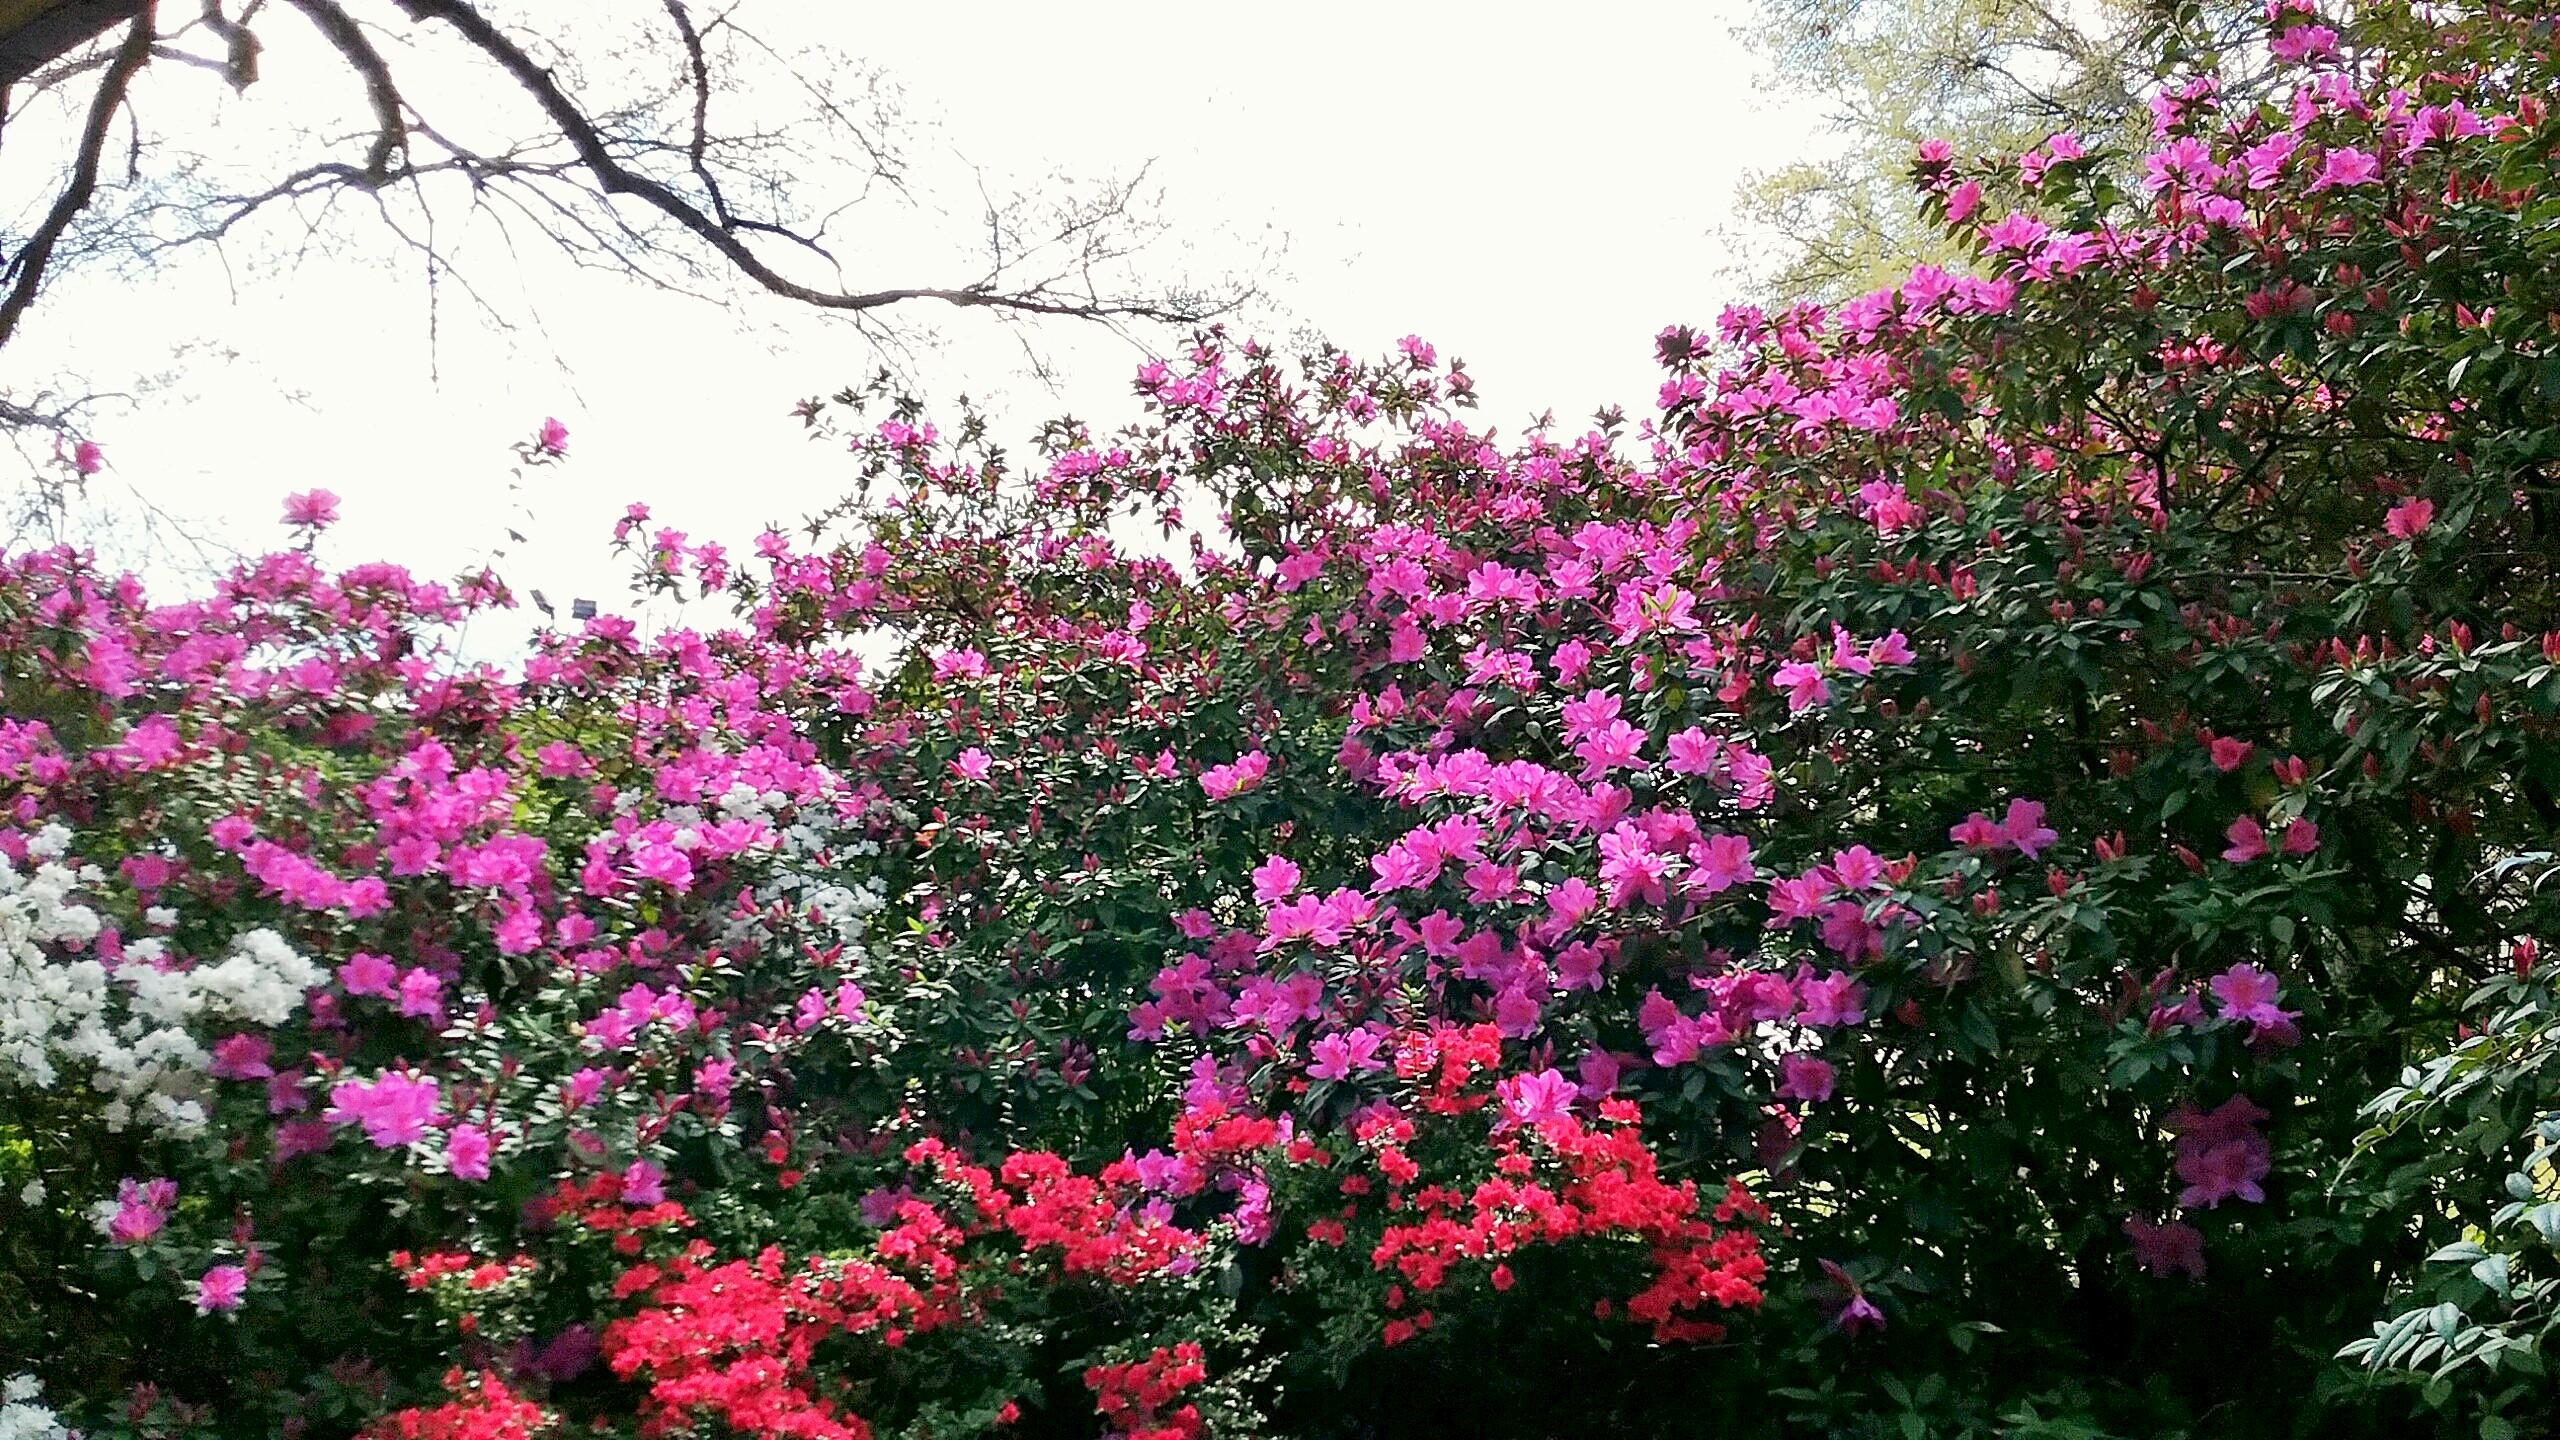 Springing Forth 2017